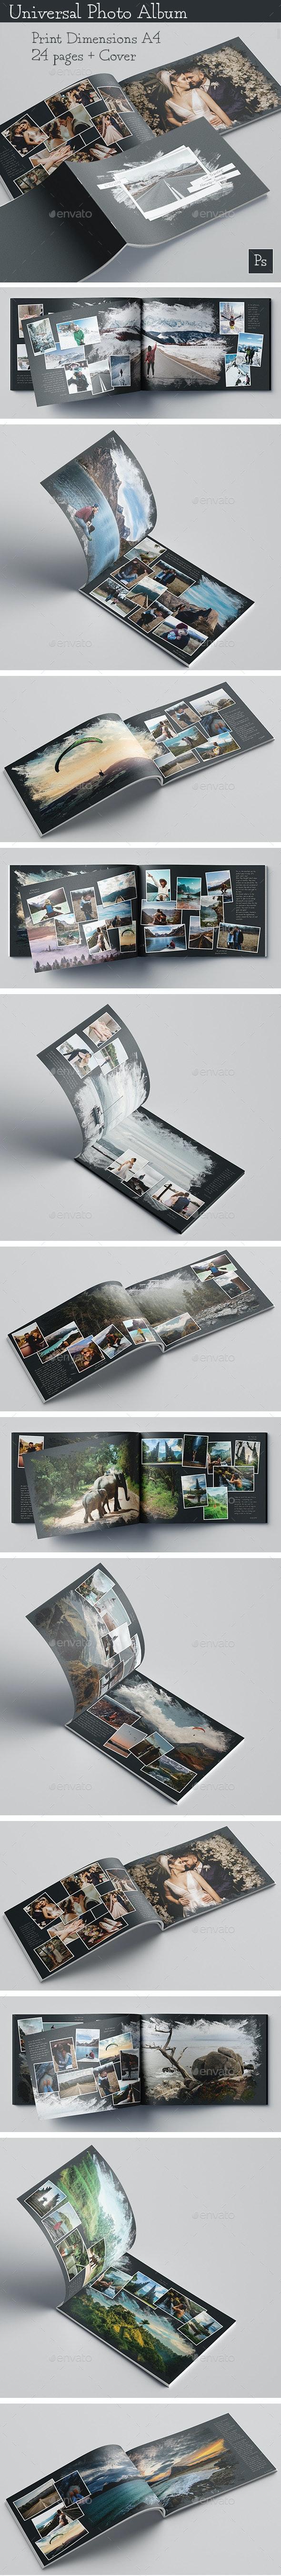 Universal Photo Album - Photo Albums Print Templates